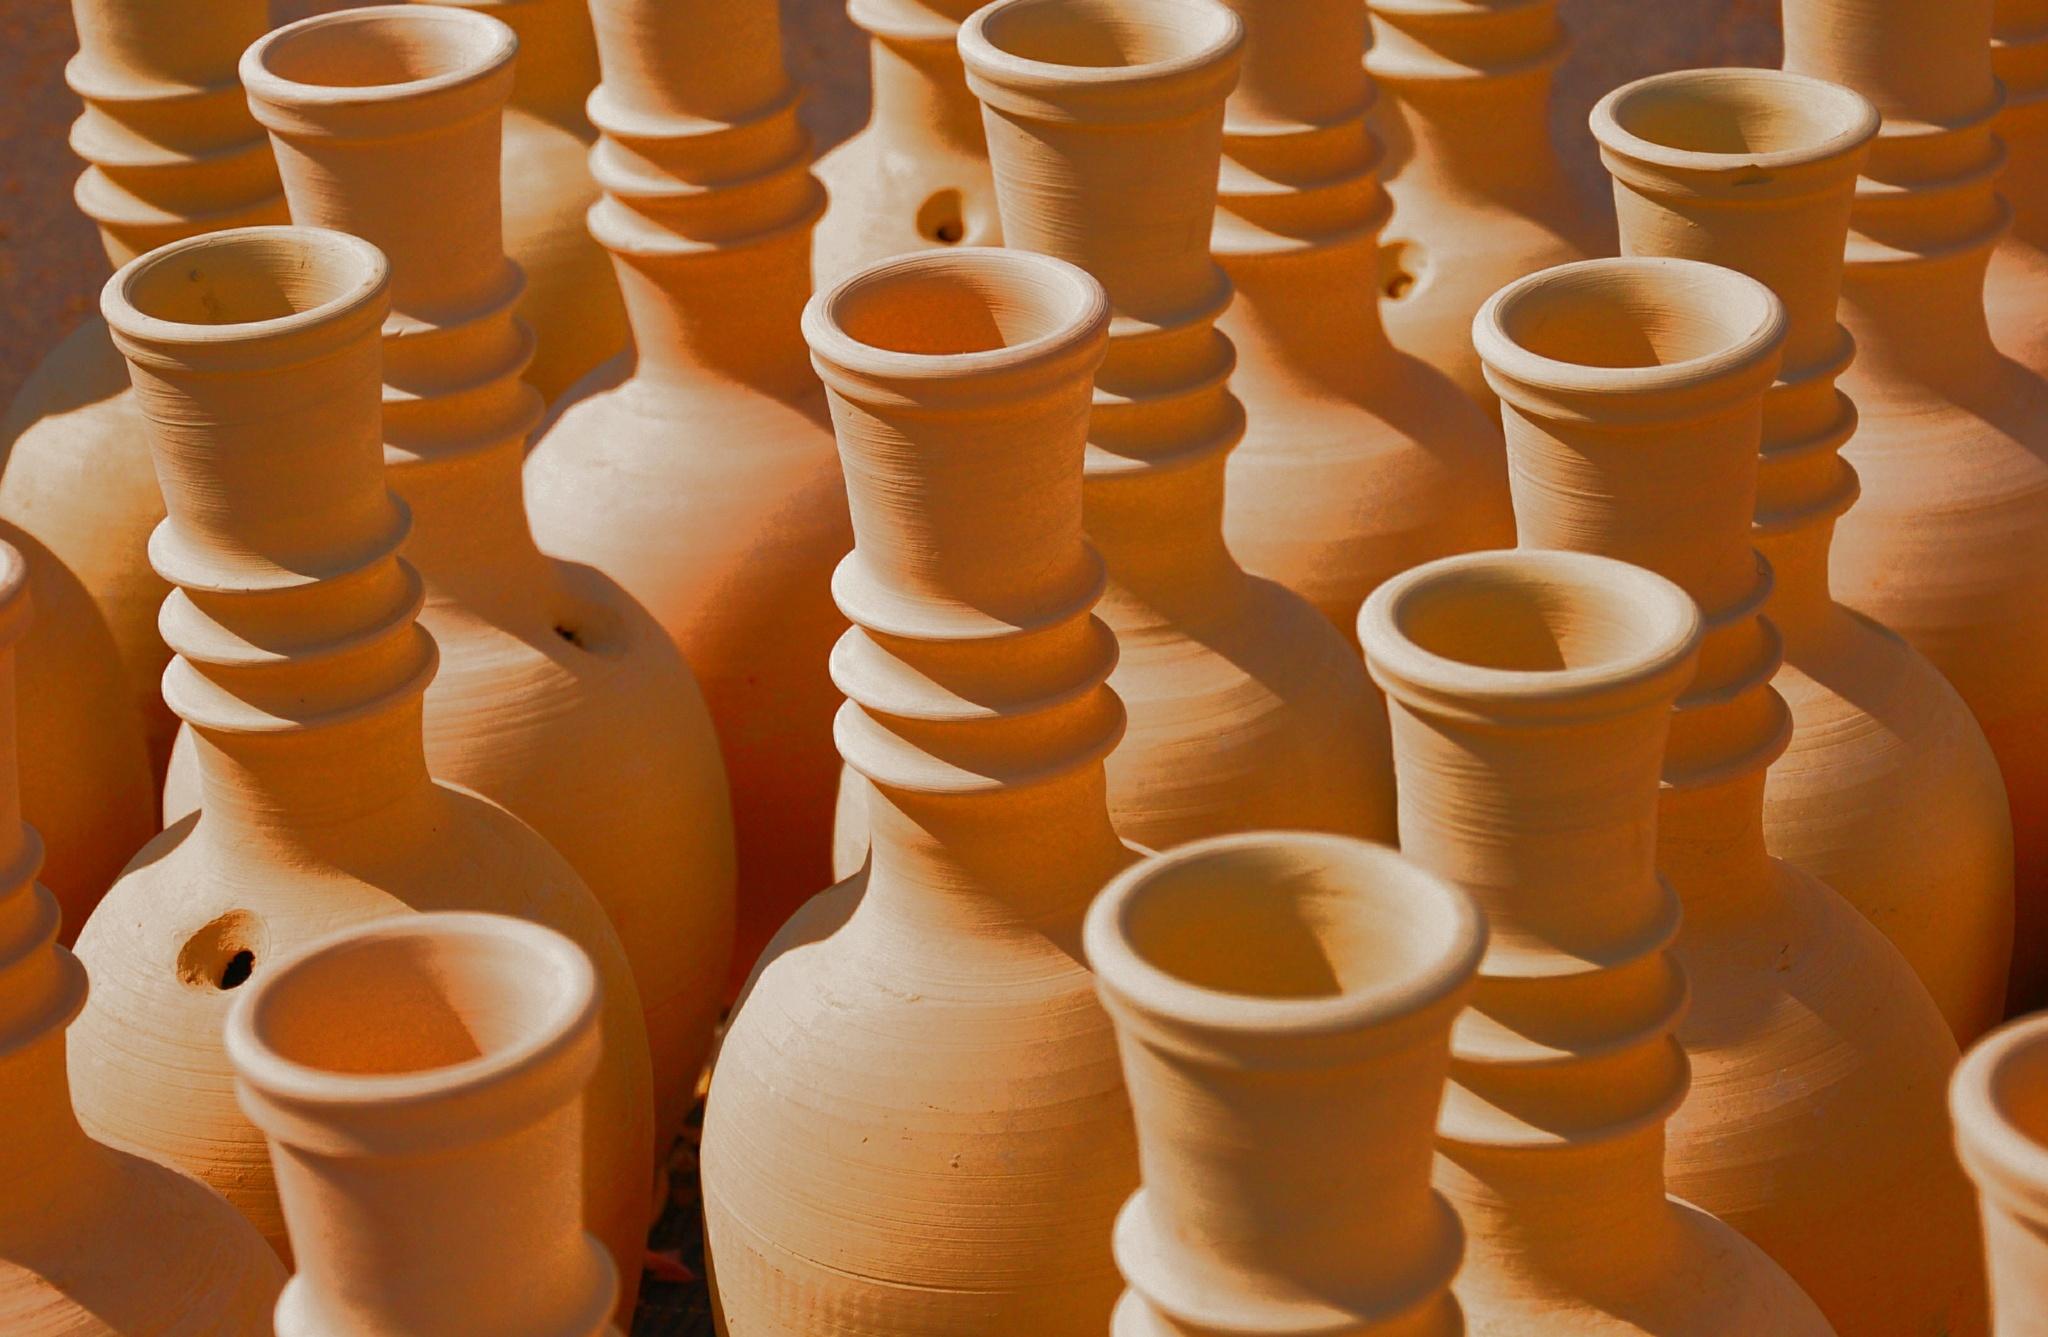 Pottery Art by Sadiq Ali AlQatari